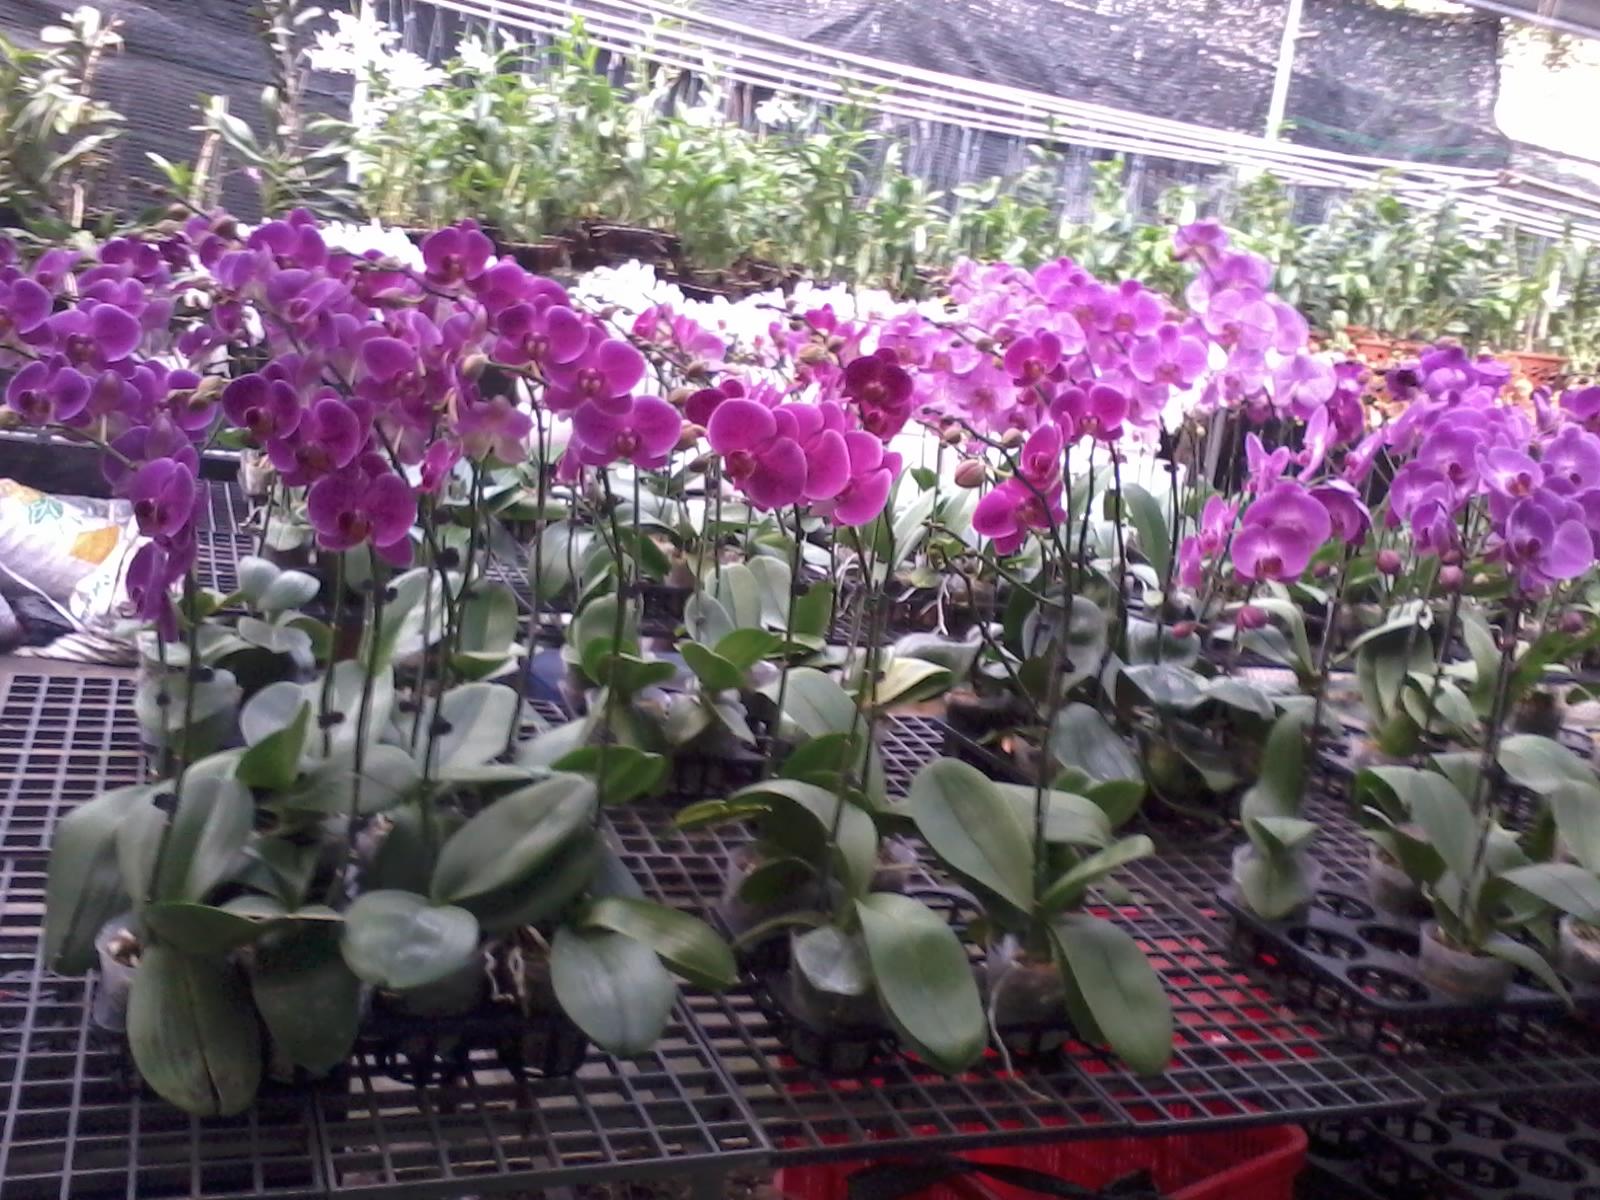 van chuyen hoa lan dip tet tu da lat di thai binh nhanh chong